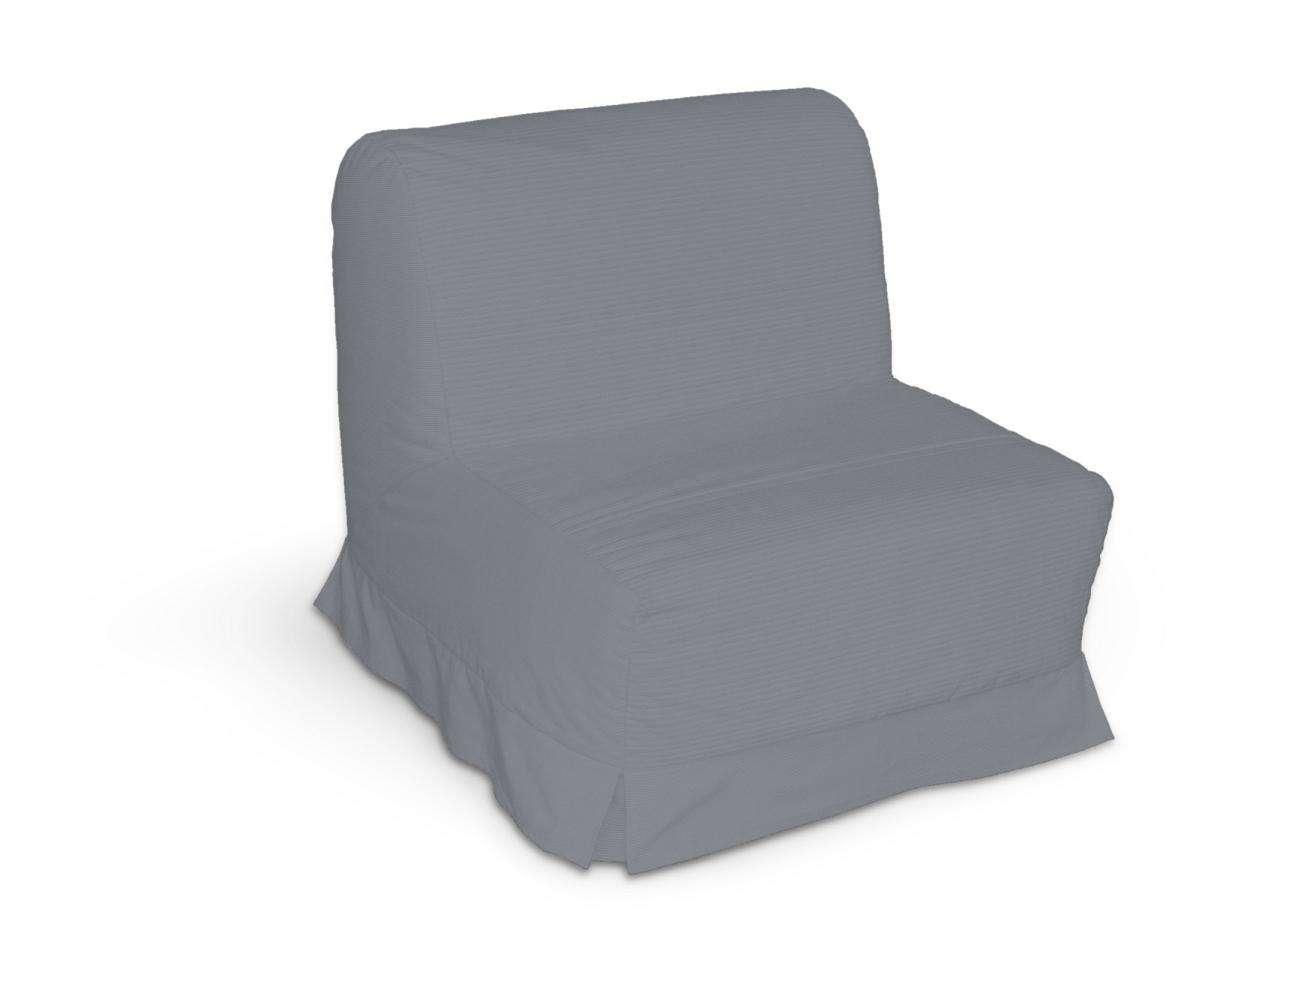 Lycksele Sesselbezug mit Kellerfalten Lycksele von der Kollektion Cotton Panama, Stoff: 702-07